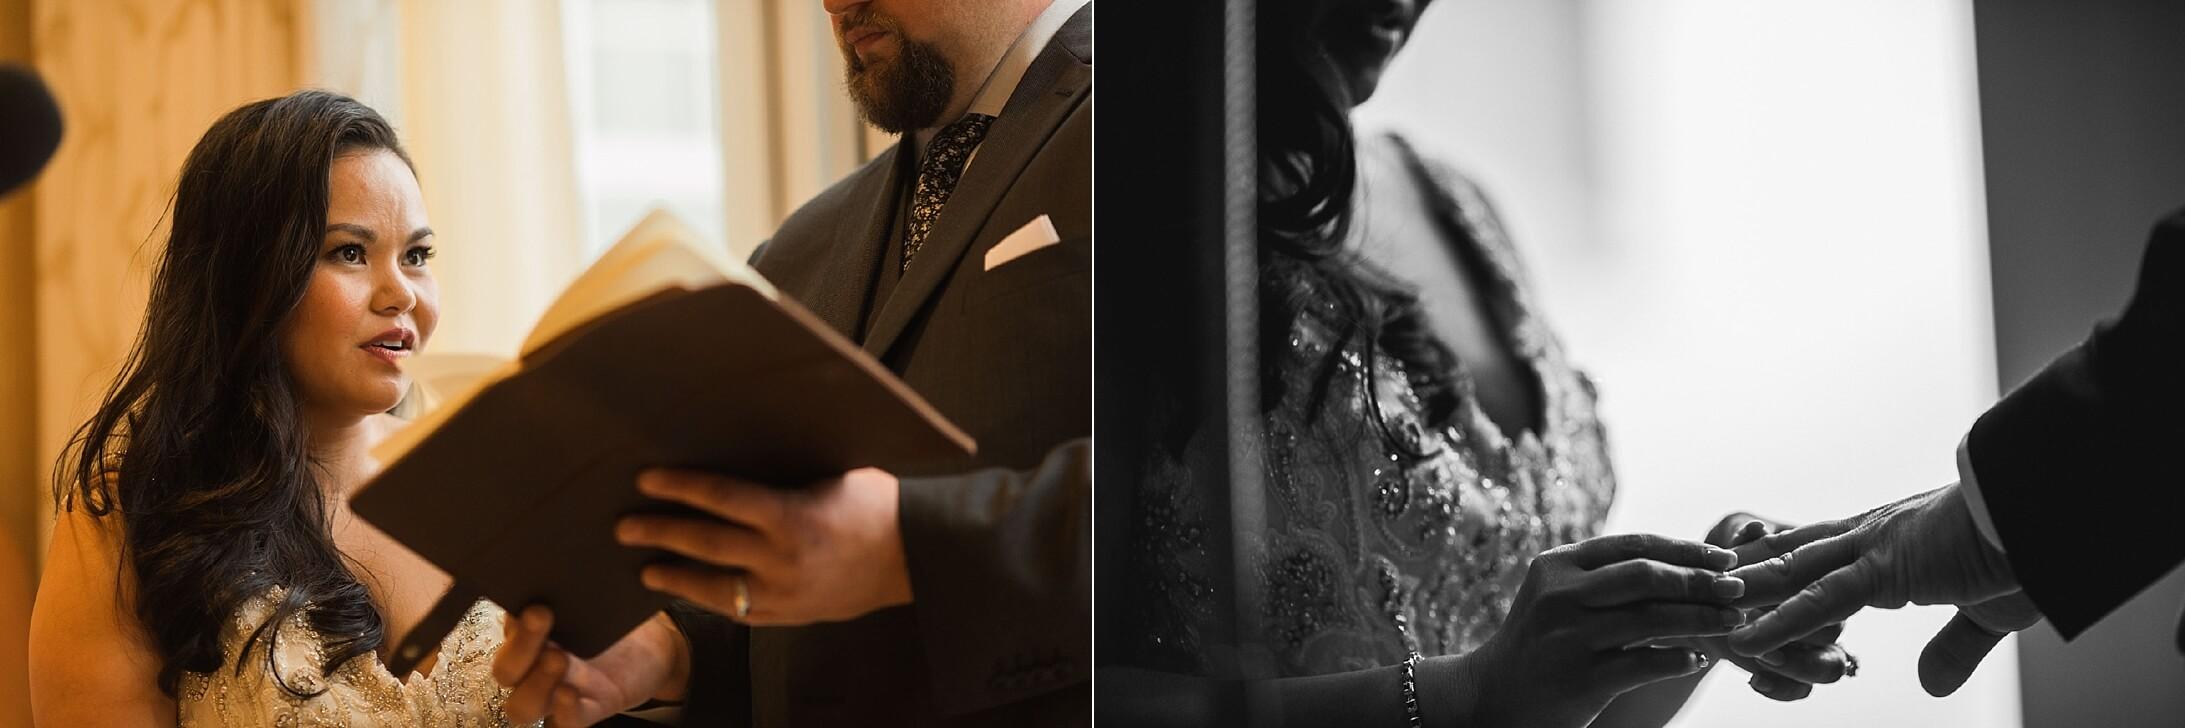 Beauport Hotel Wedding - Ebersole Photo_0011.jpg